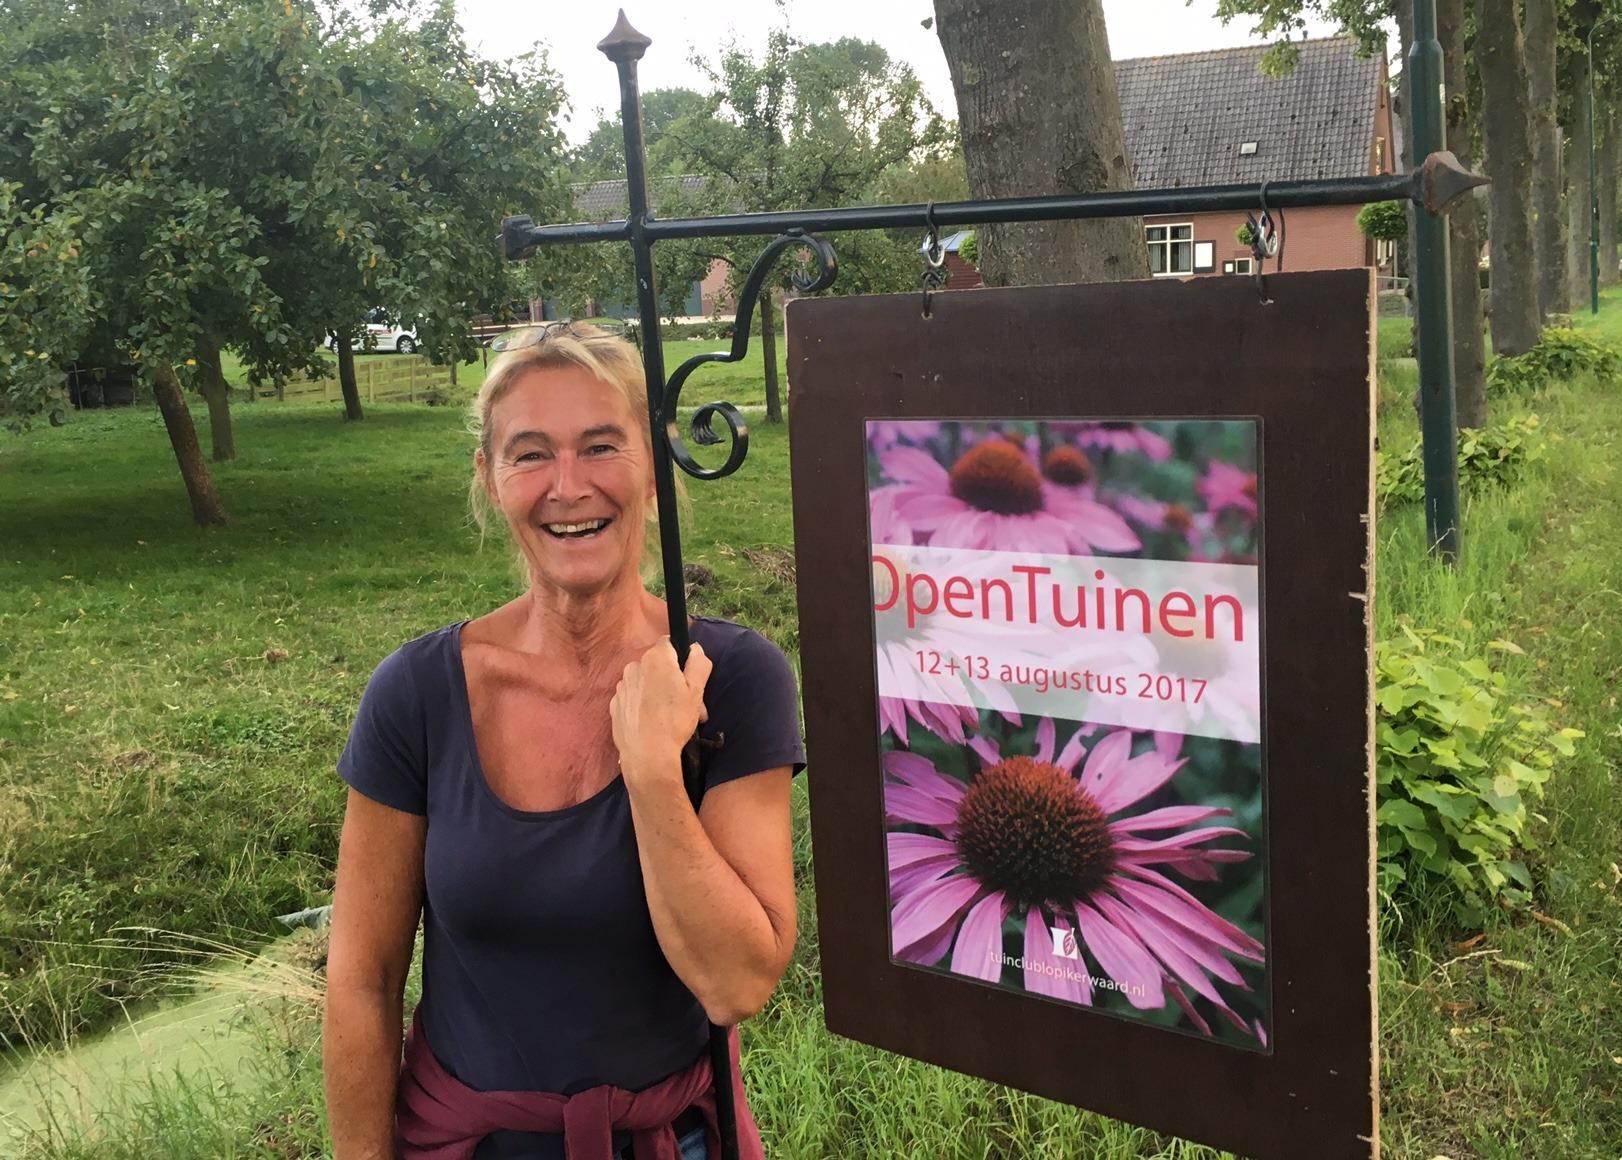 Anita van Leyden